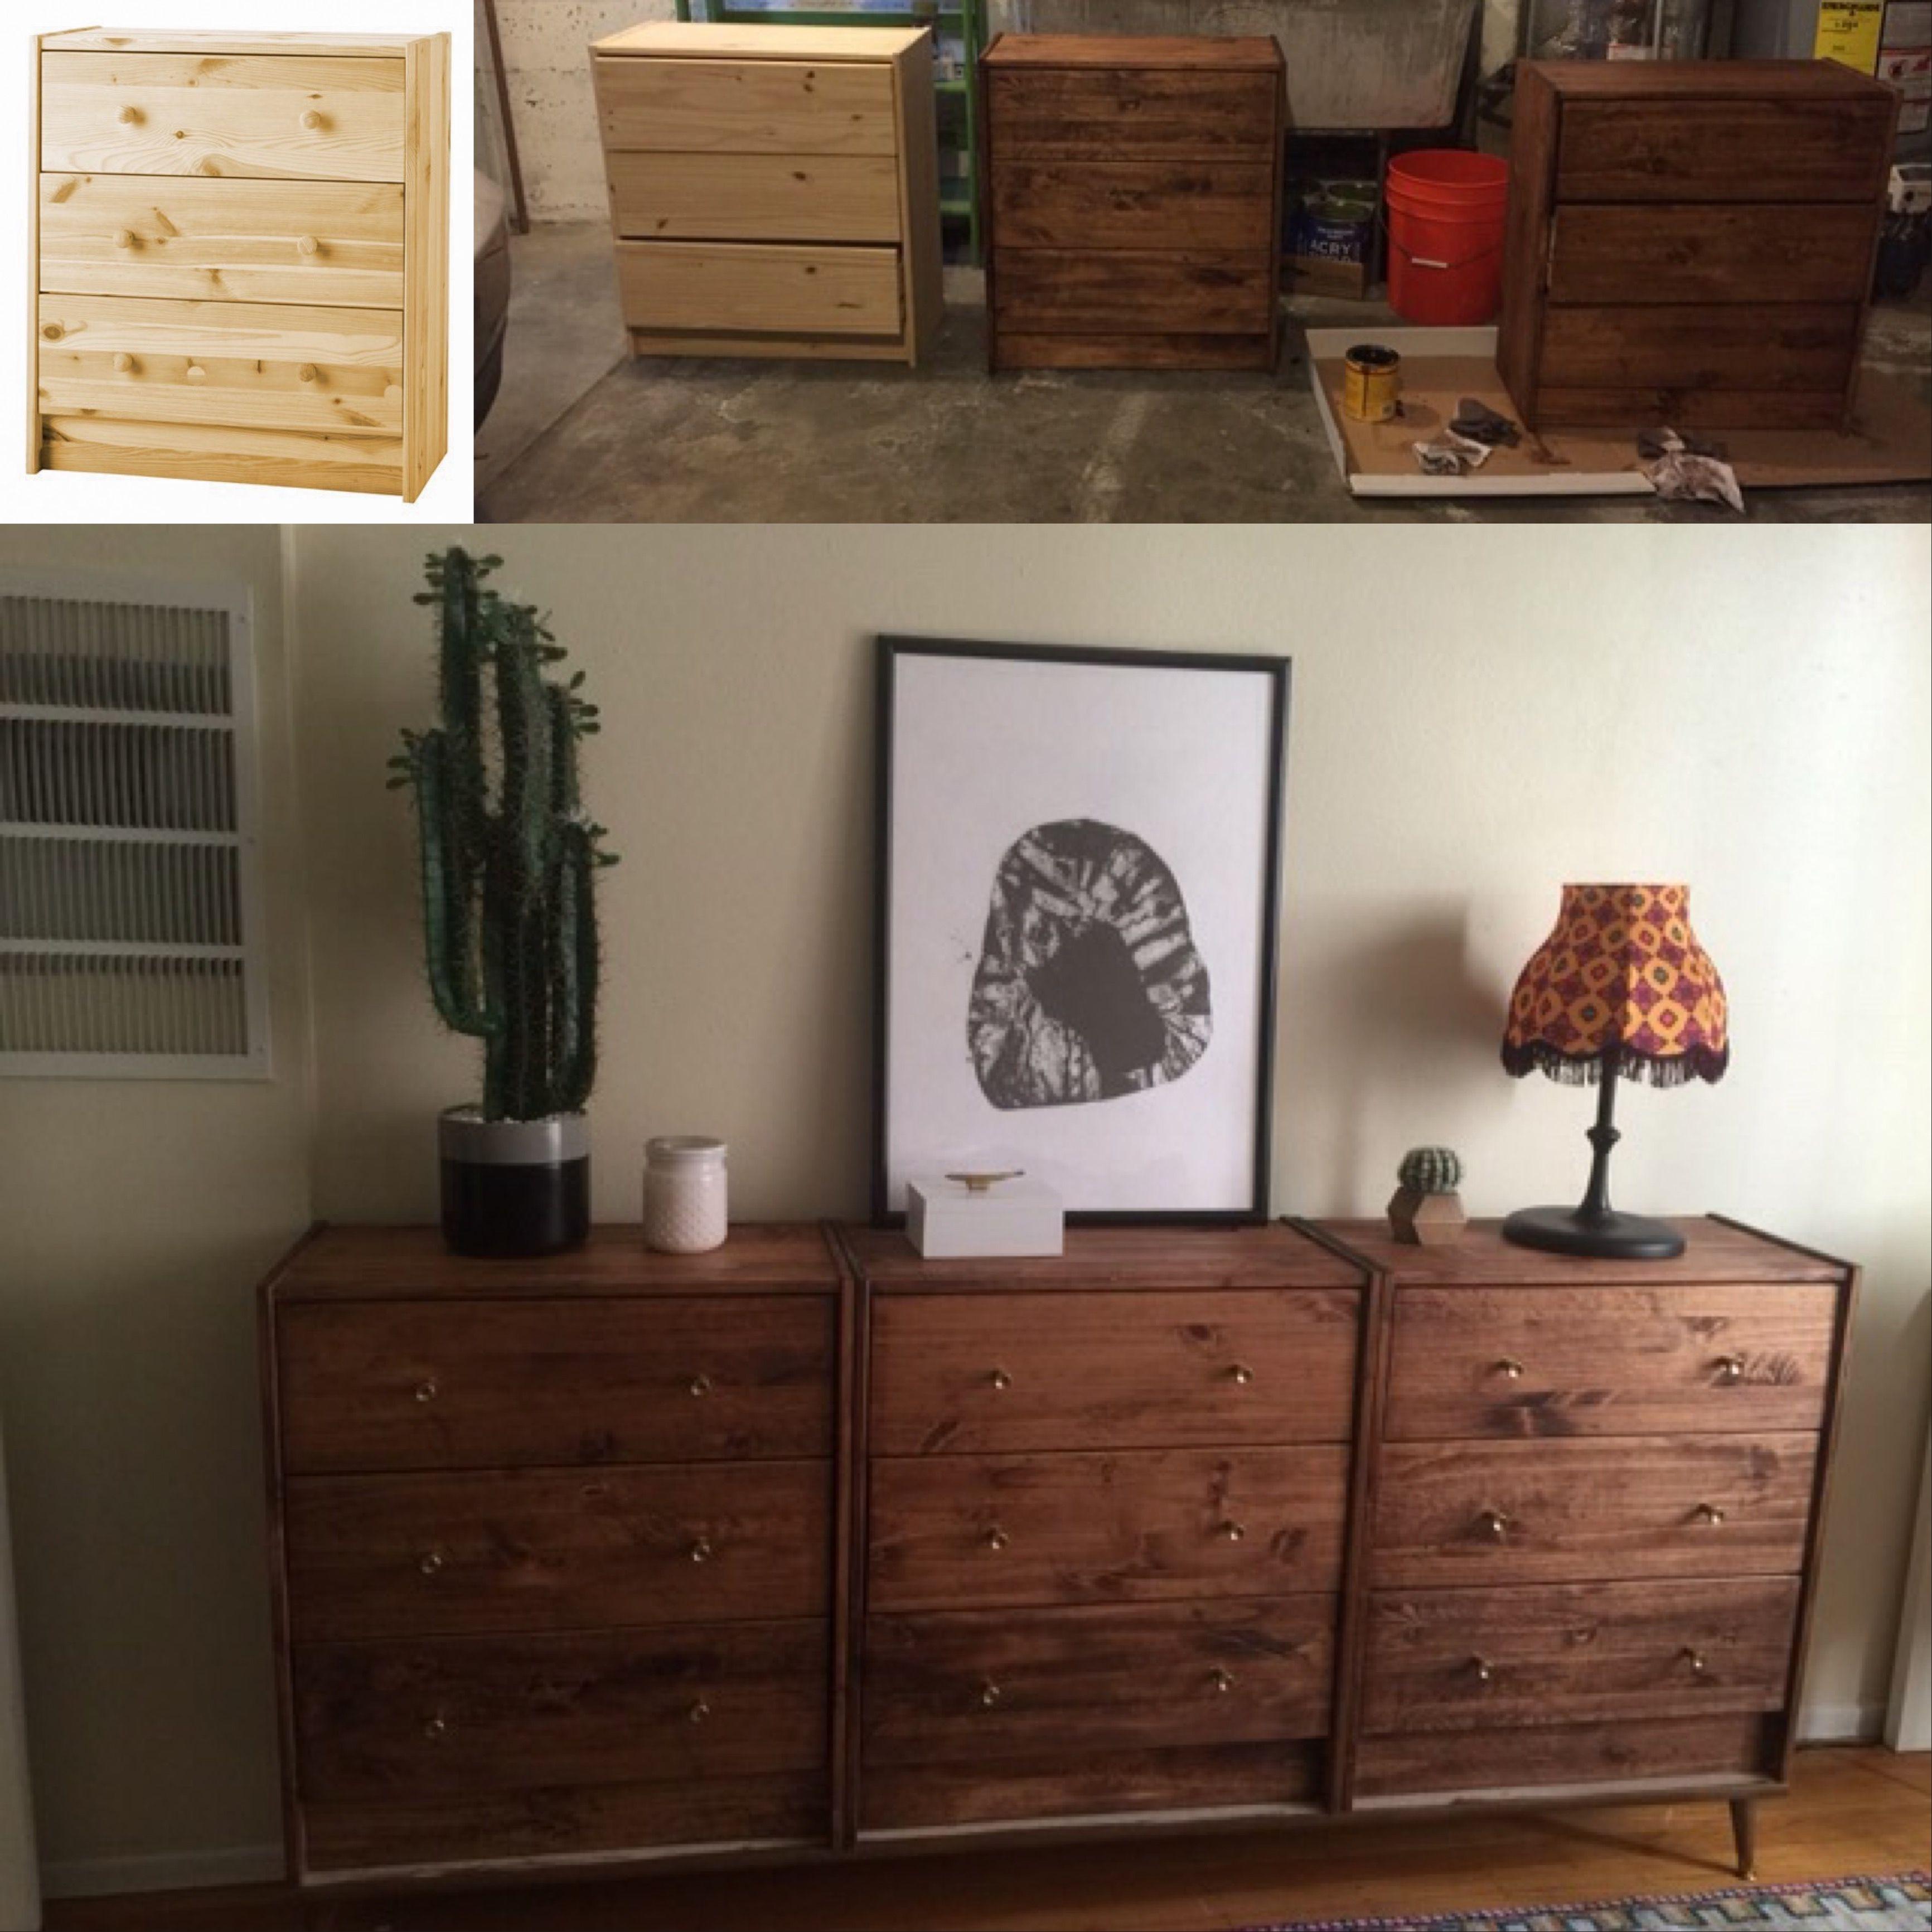 My Diy Ikea Rast Dresser Project 3